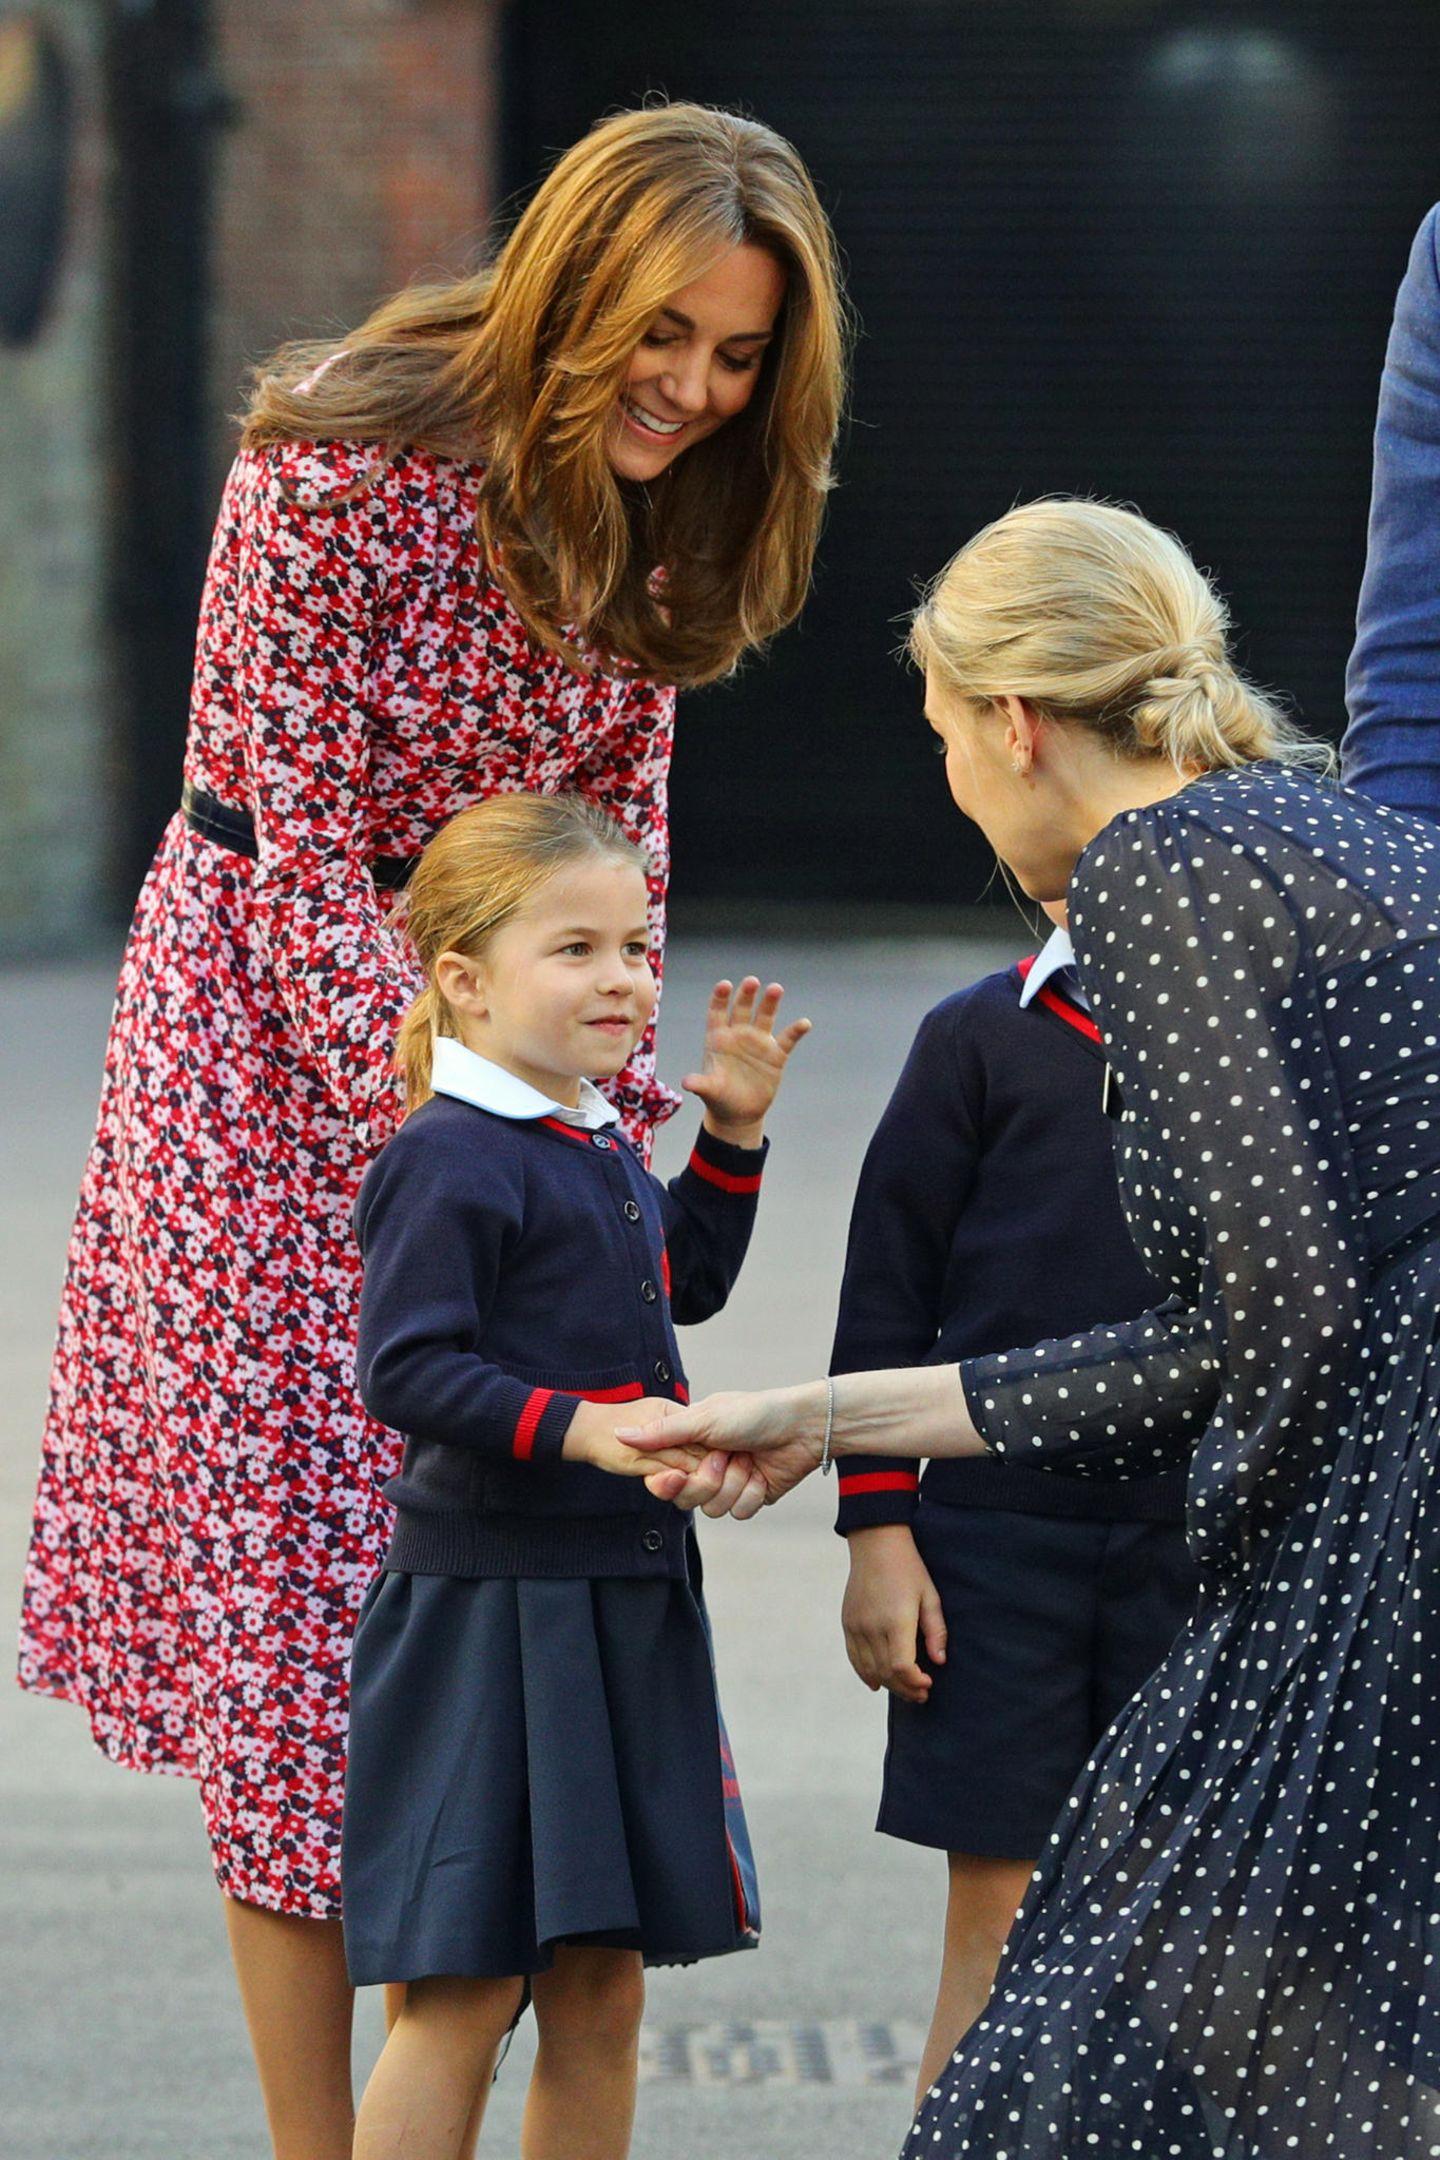 Royale Kinderfotos: Prinzessin Charlotte gibt Frau die Hand